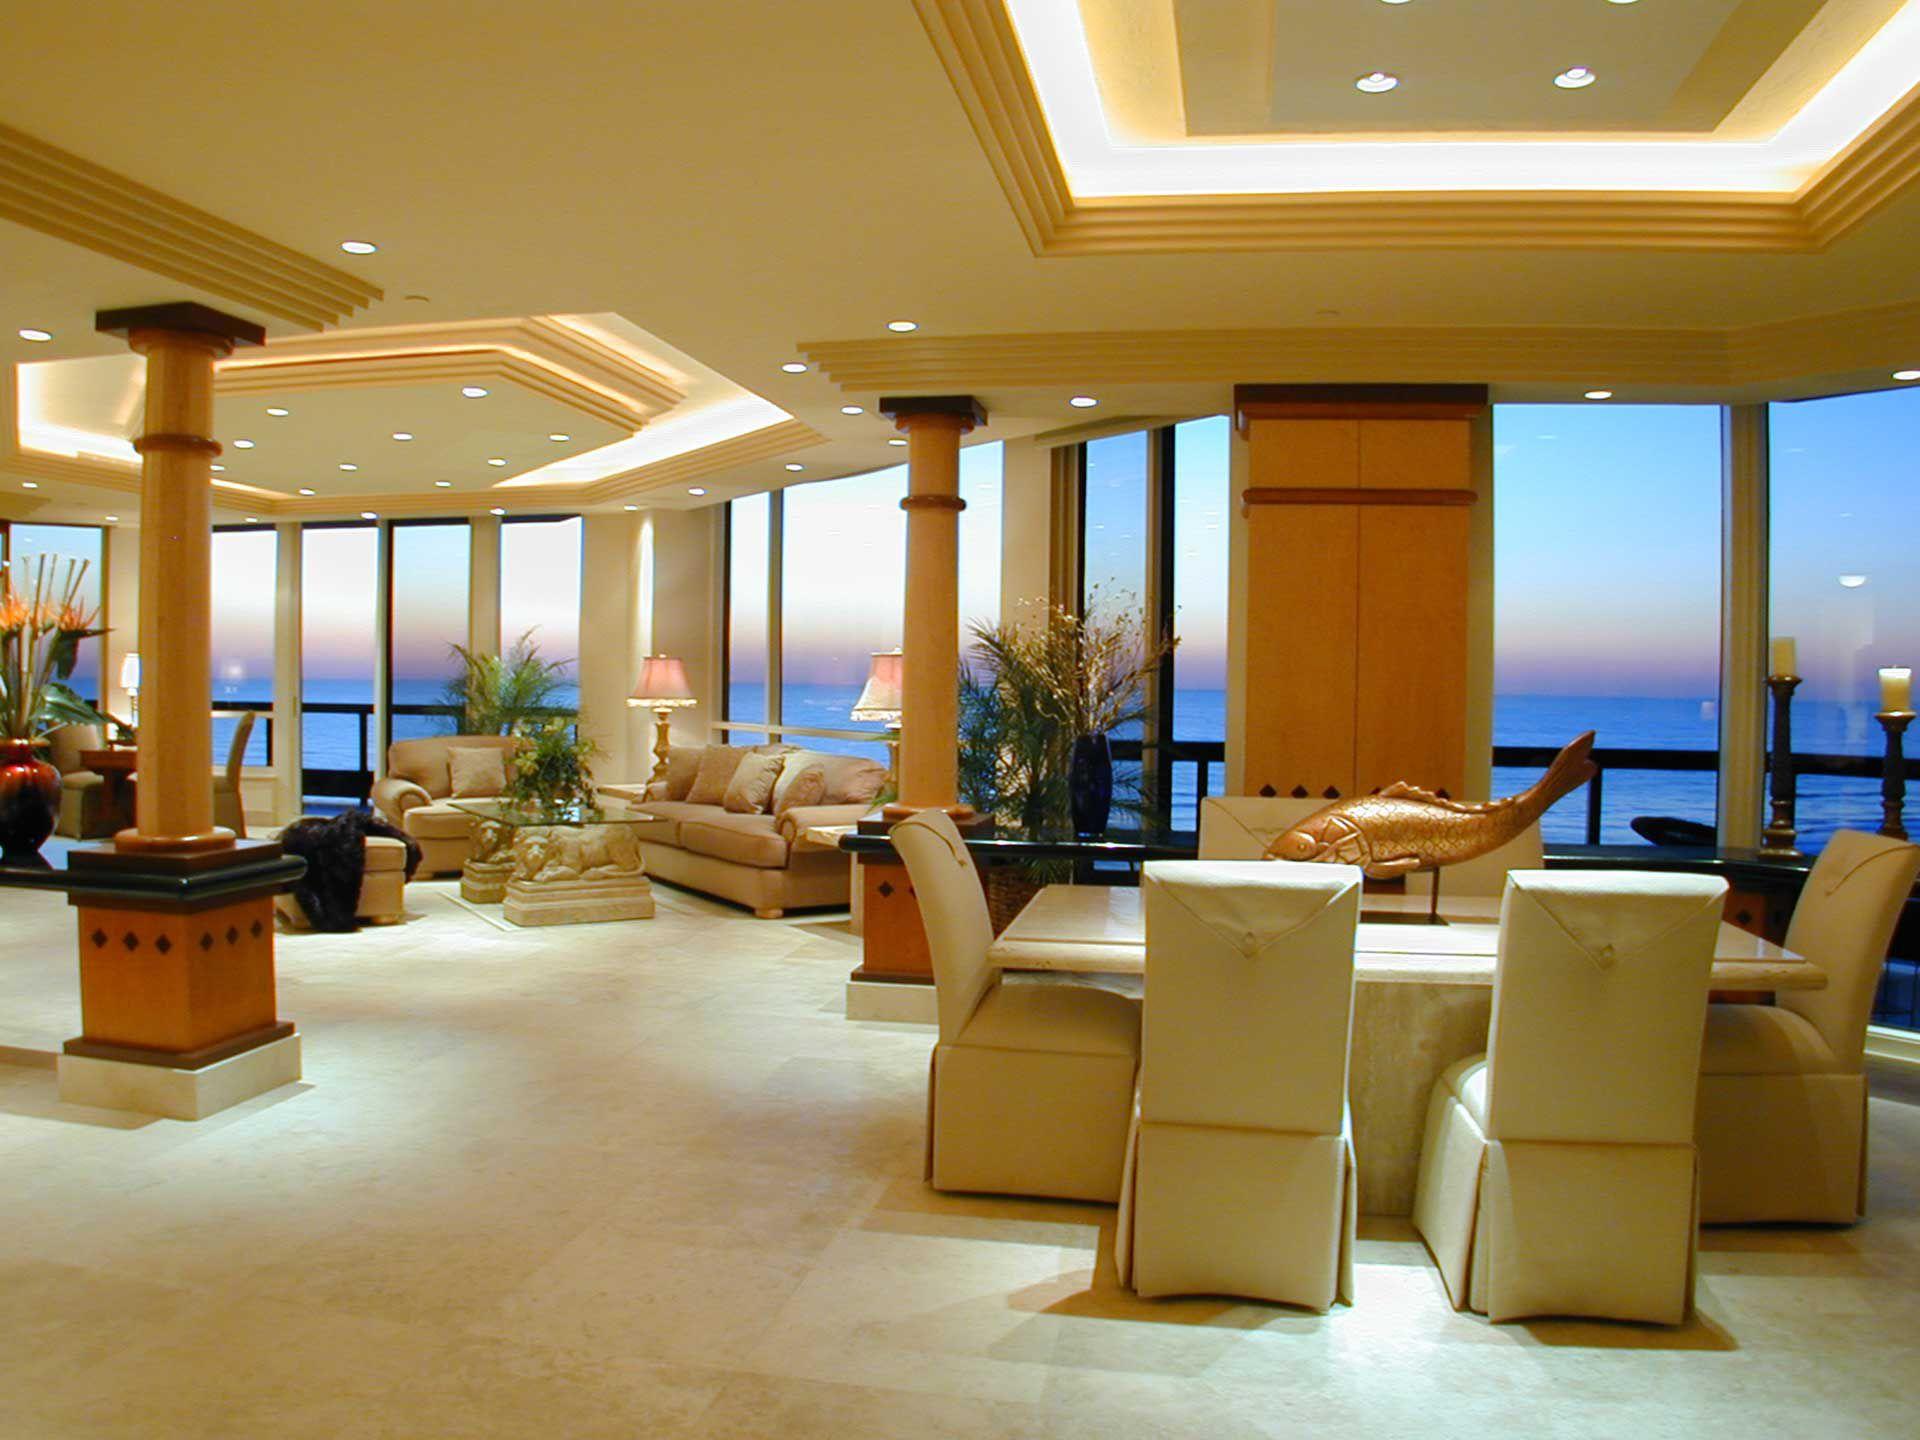 Luxury Condominiums - Action Realty of Sarasota